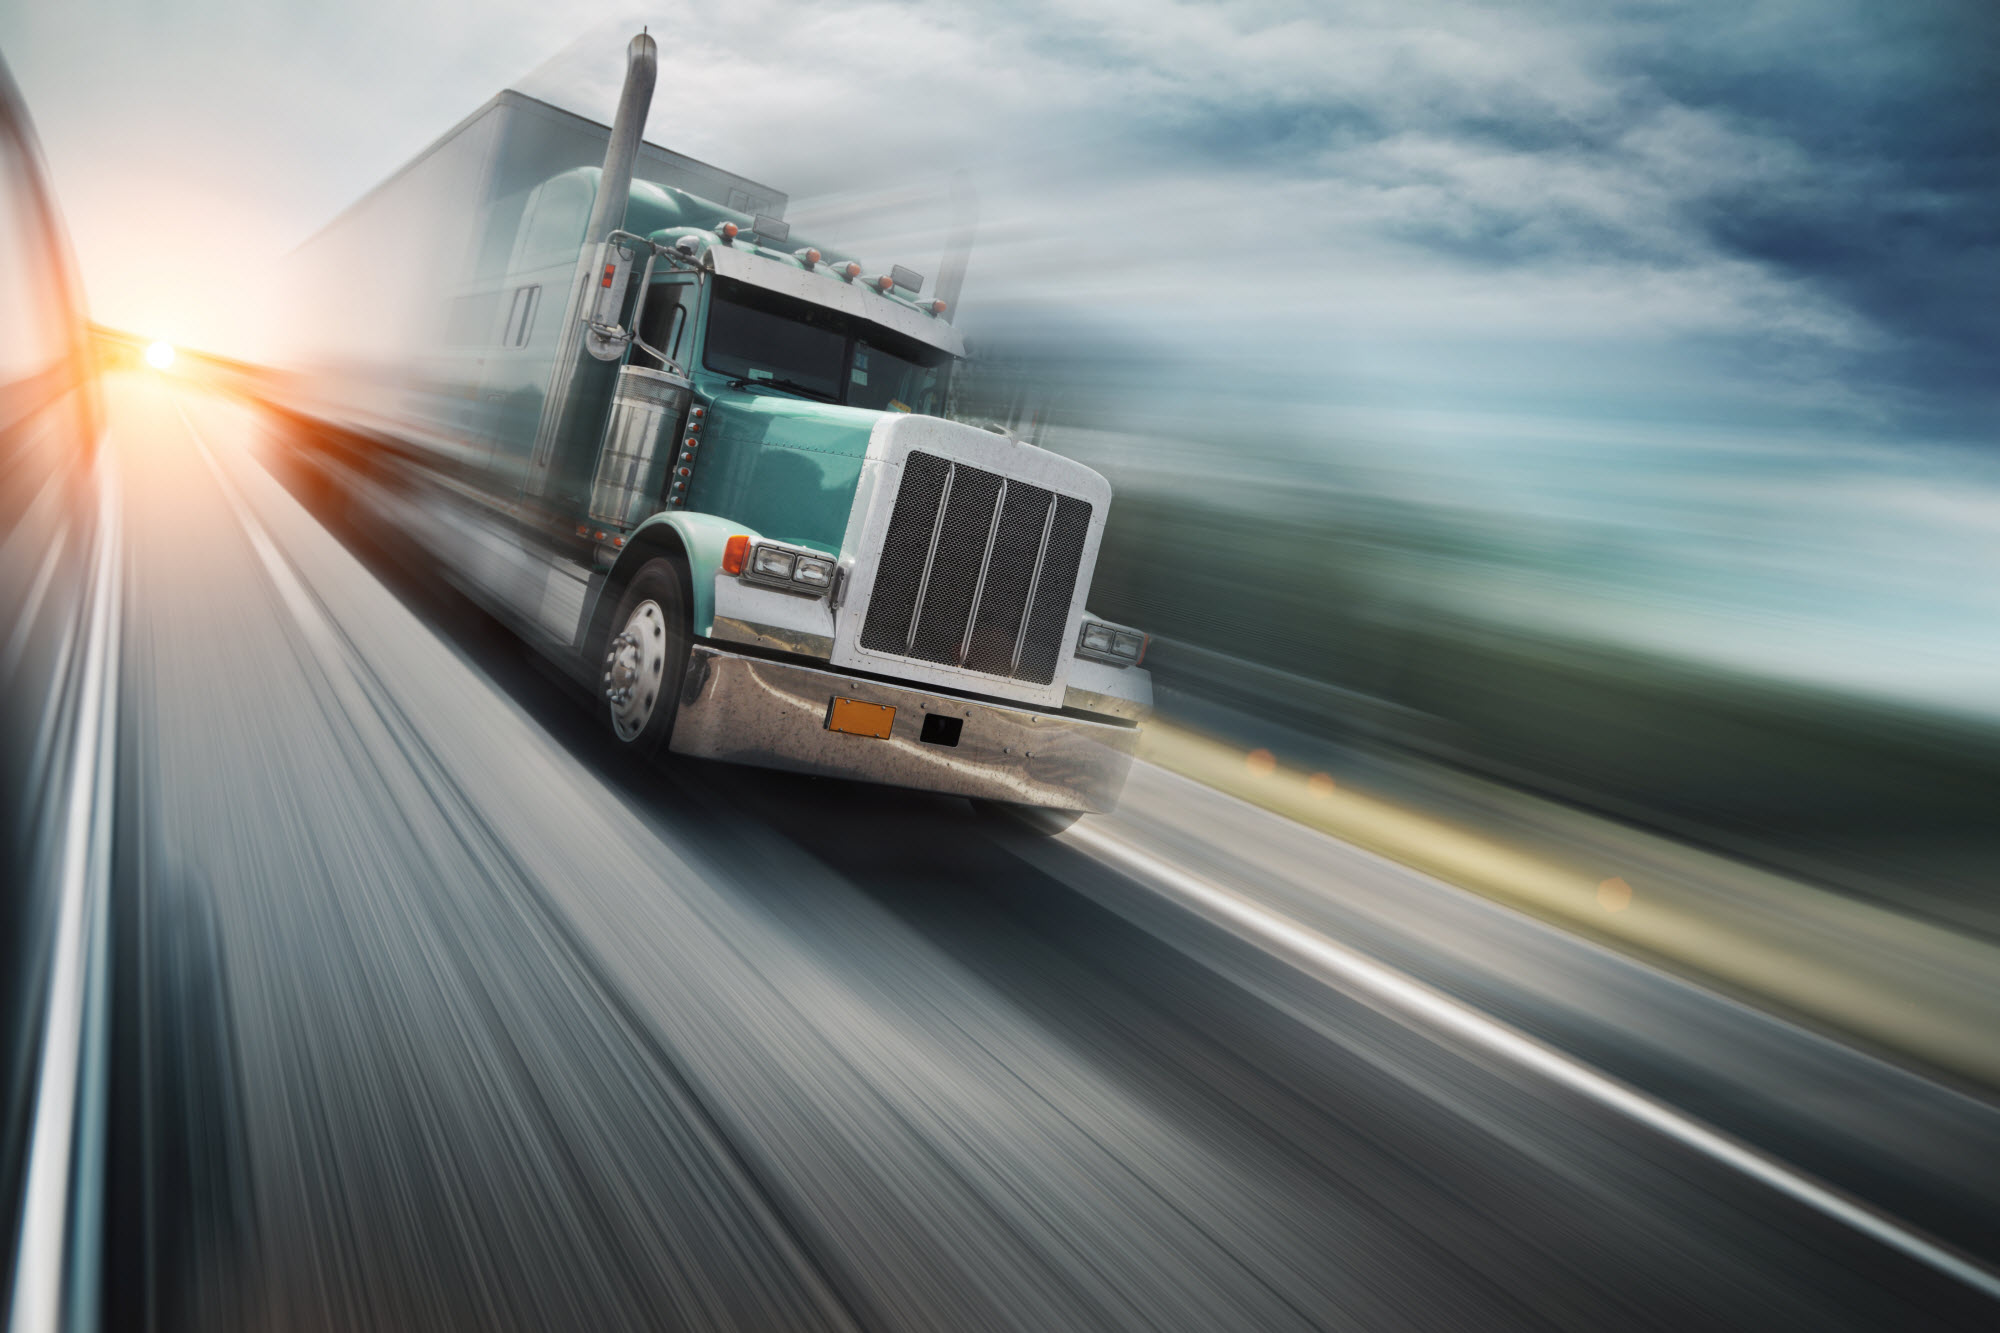 18-Wheeler Tractor-Trailers Truck